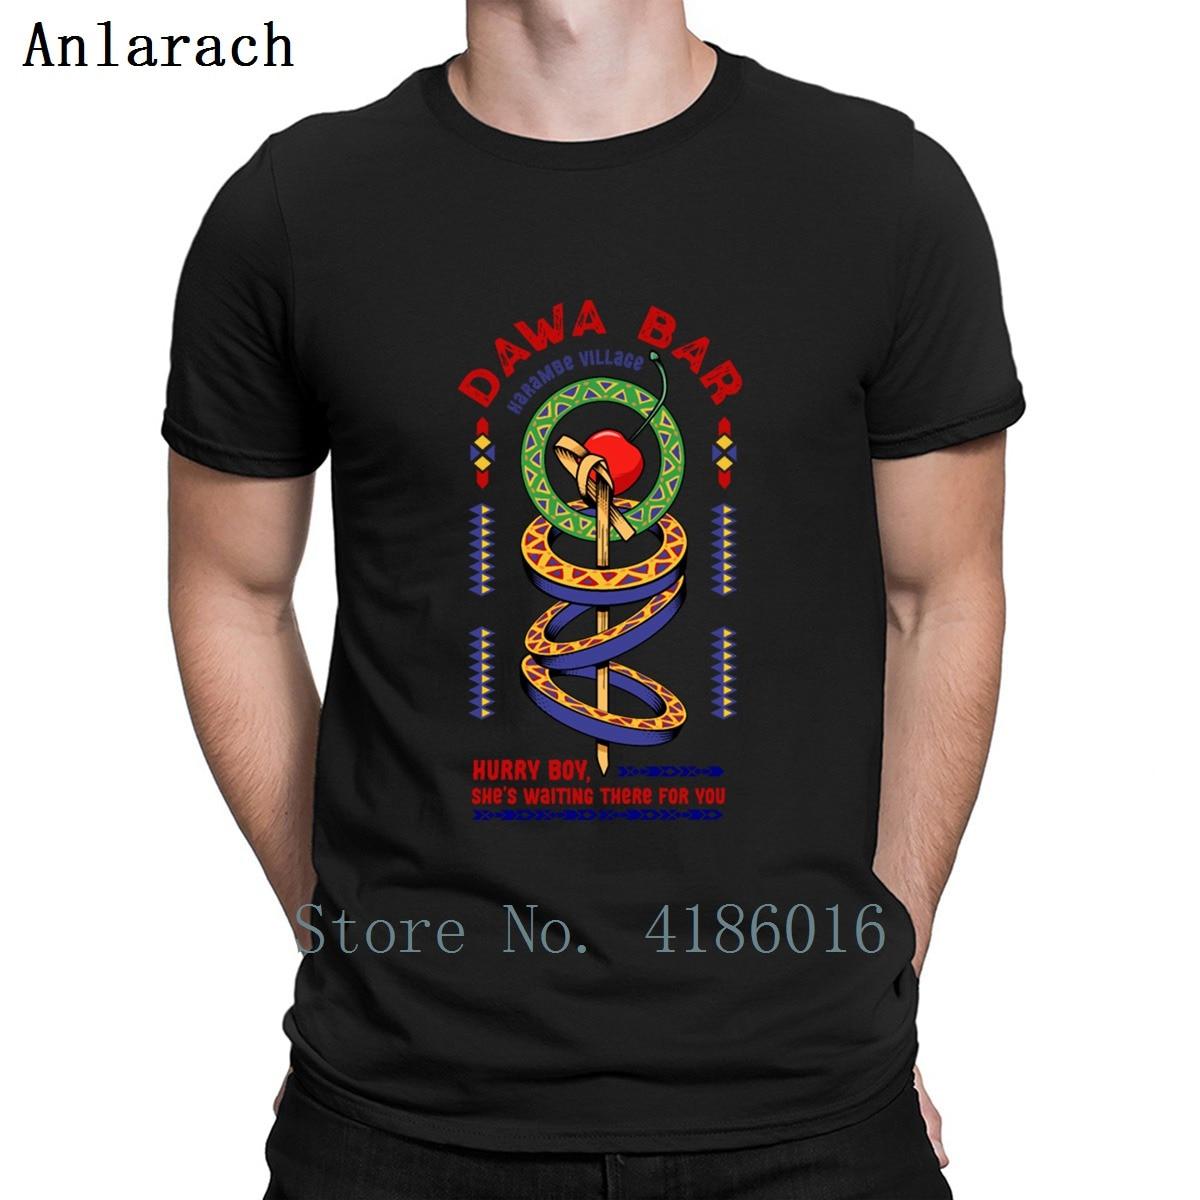 Dawa Toto camiseta alternativa impresión Anti-arrugas patrón letra primavera otoño S-4XL Camisa de algodón transpirable